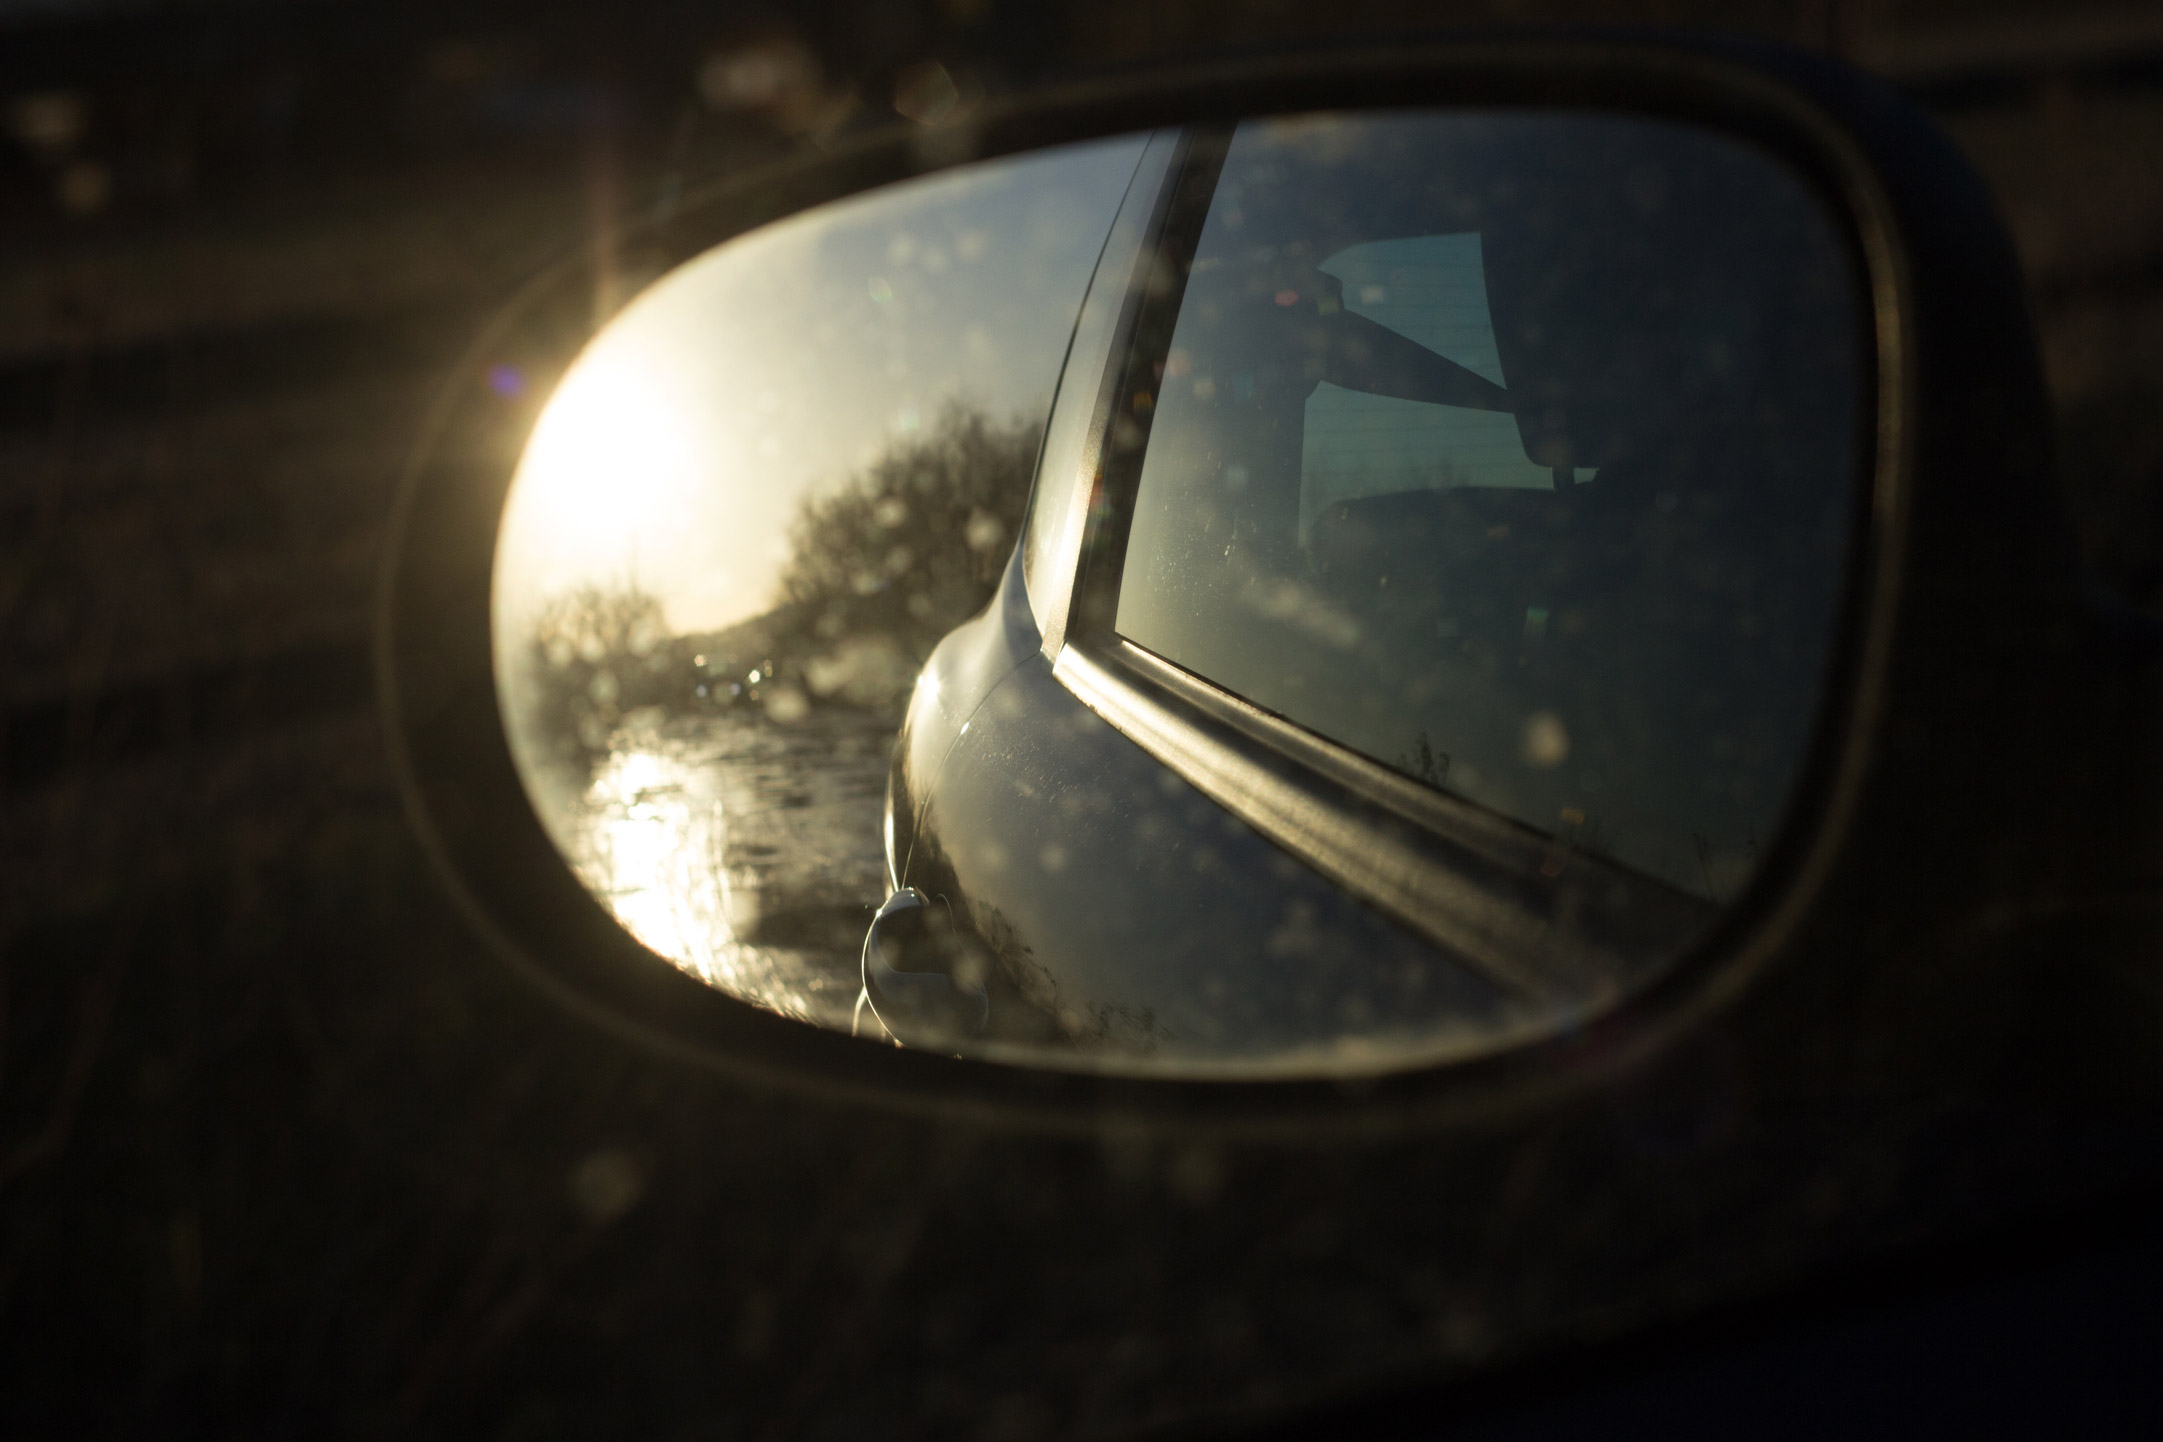 newborn-photography-hemel-hempstead-january-wing-mirror.jpg